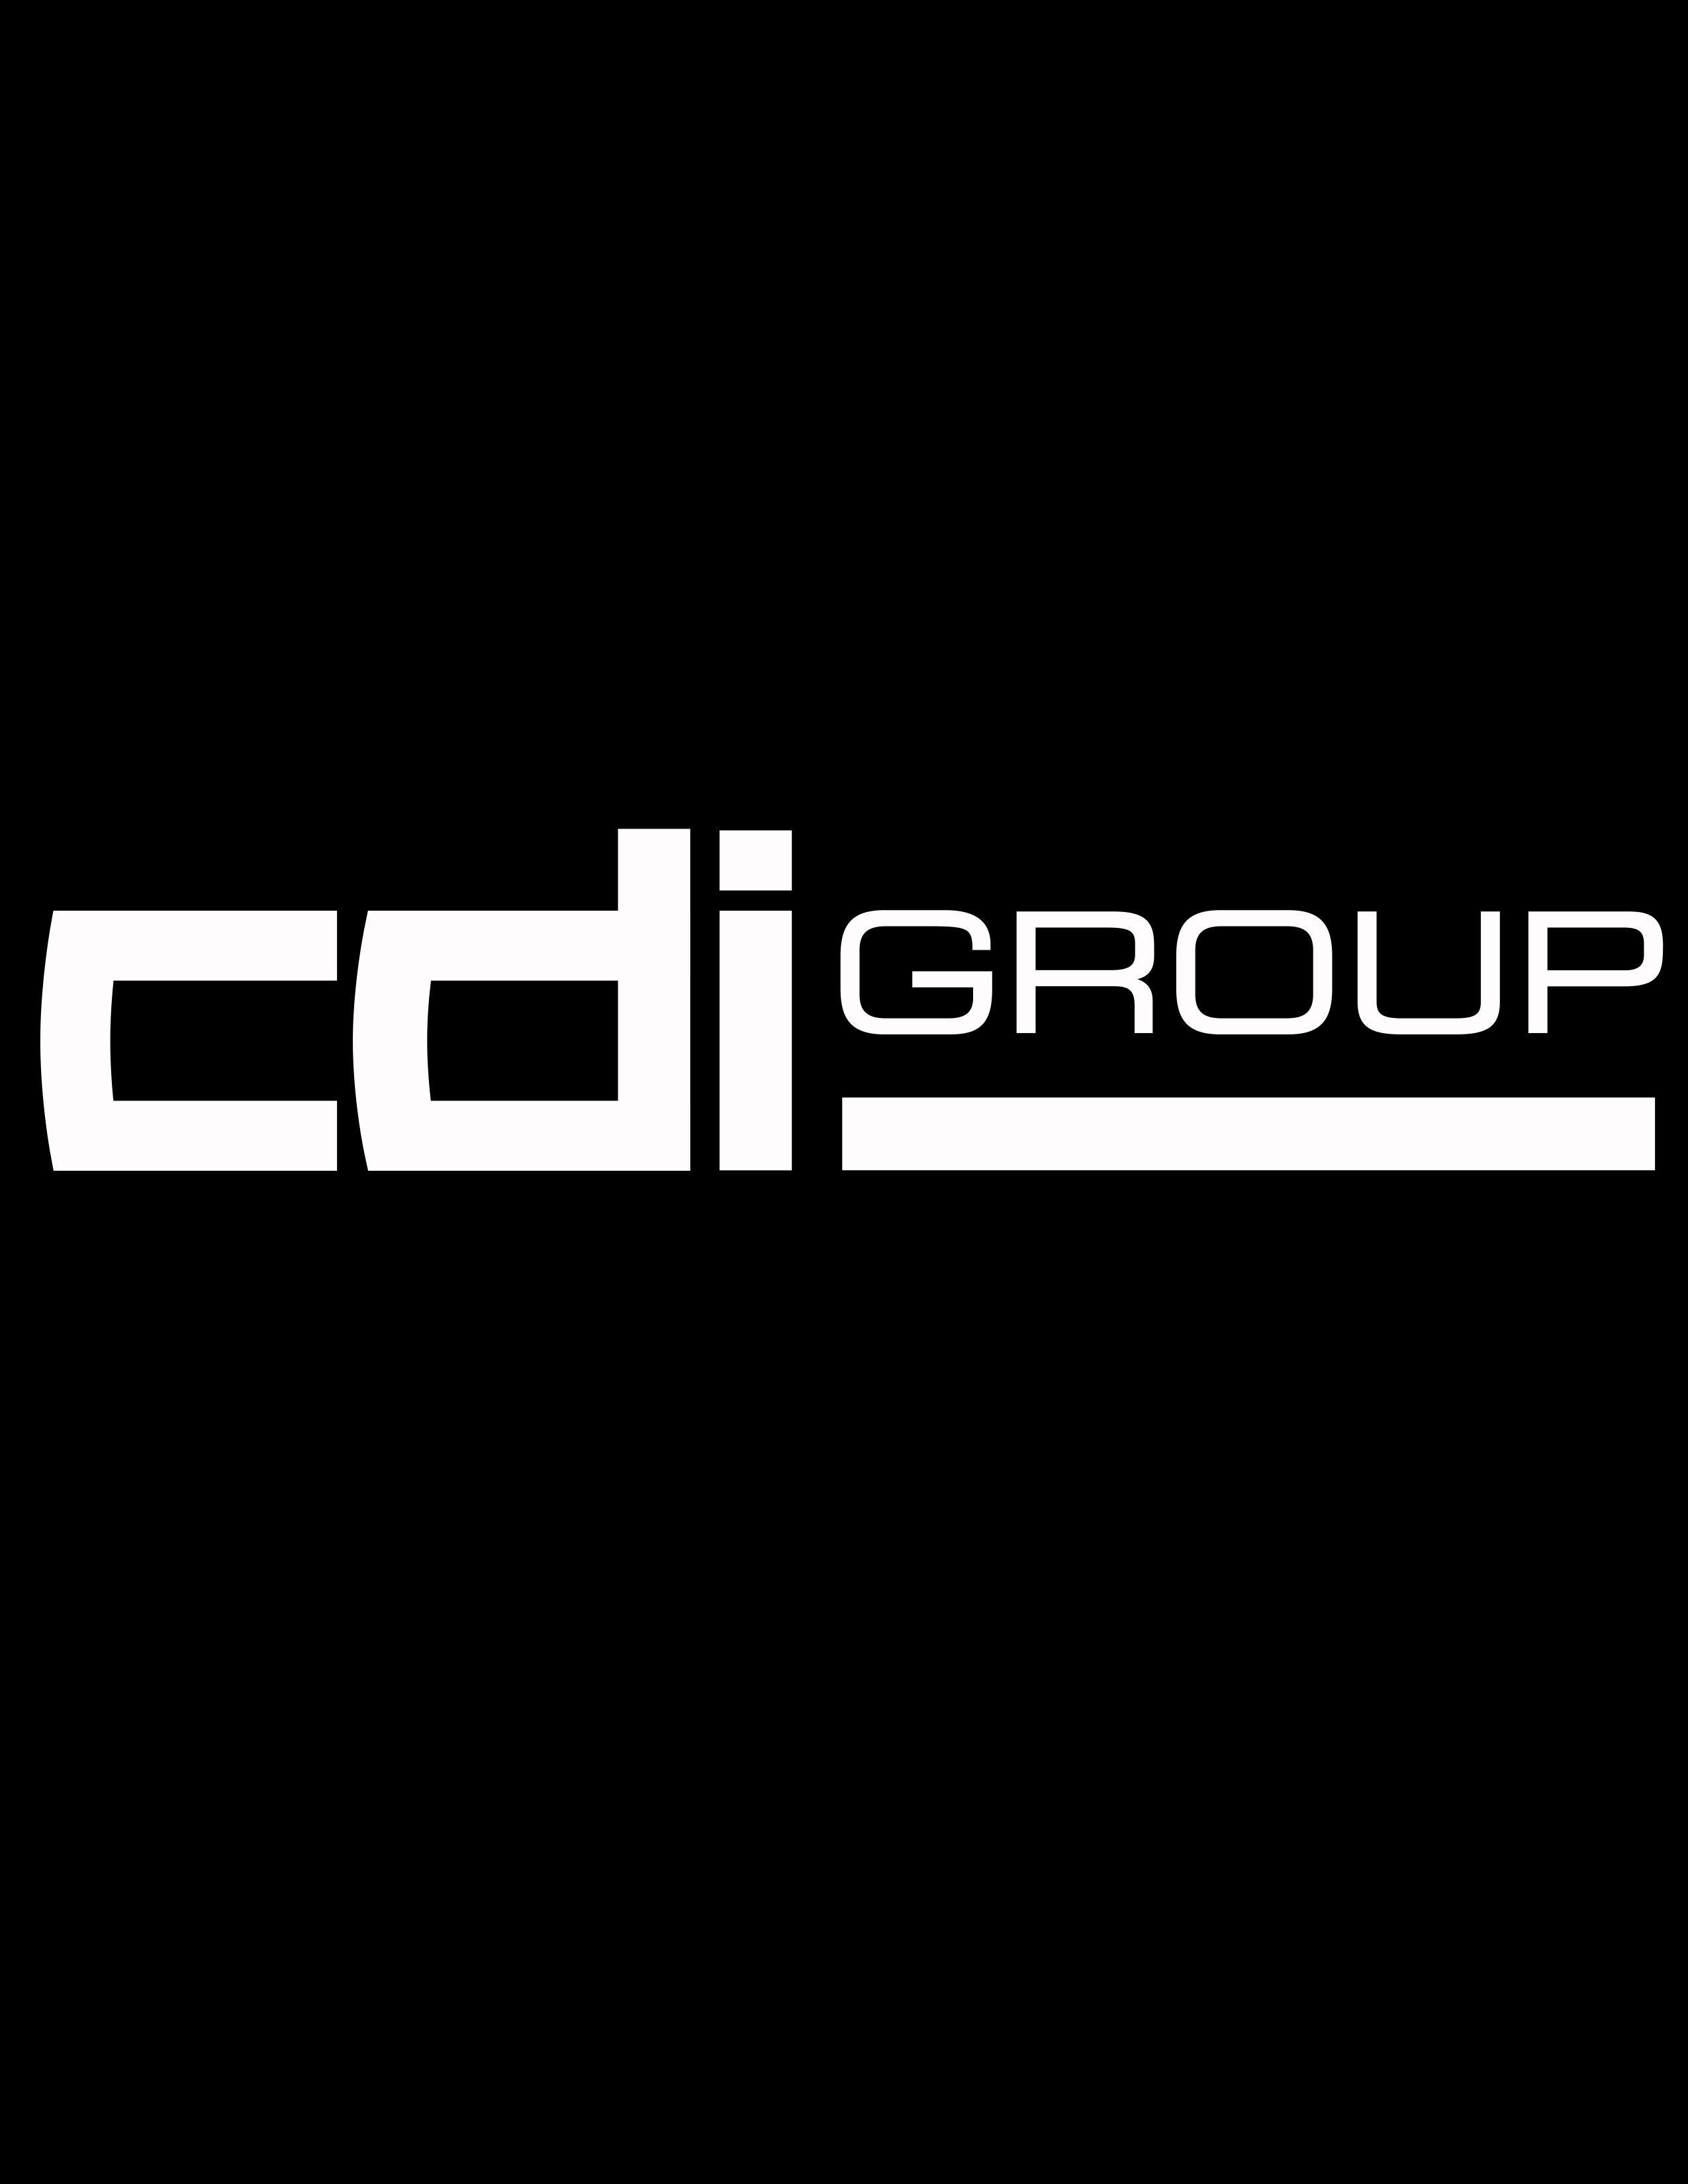 CDI Group